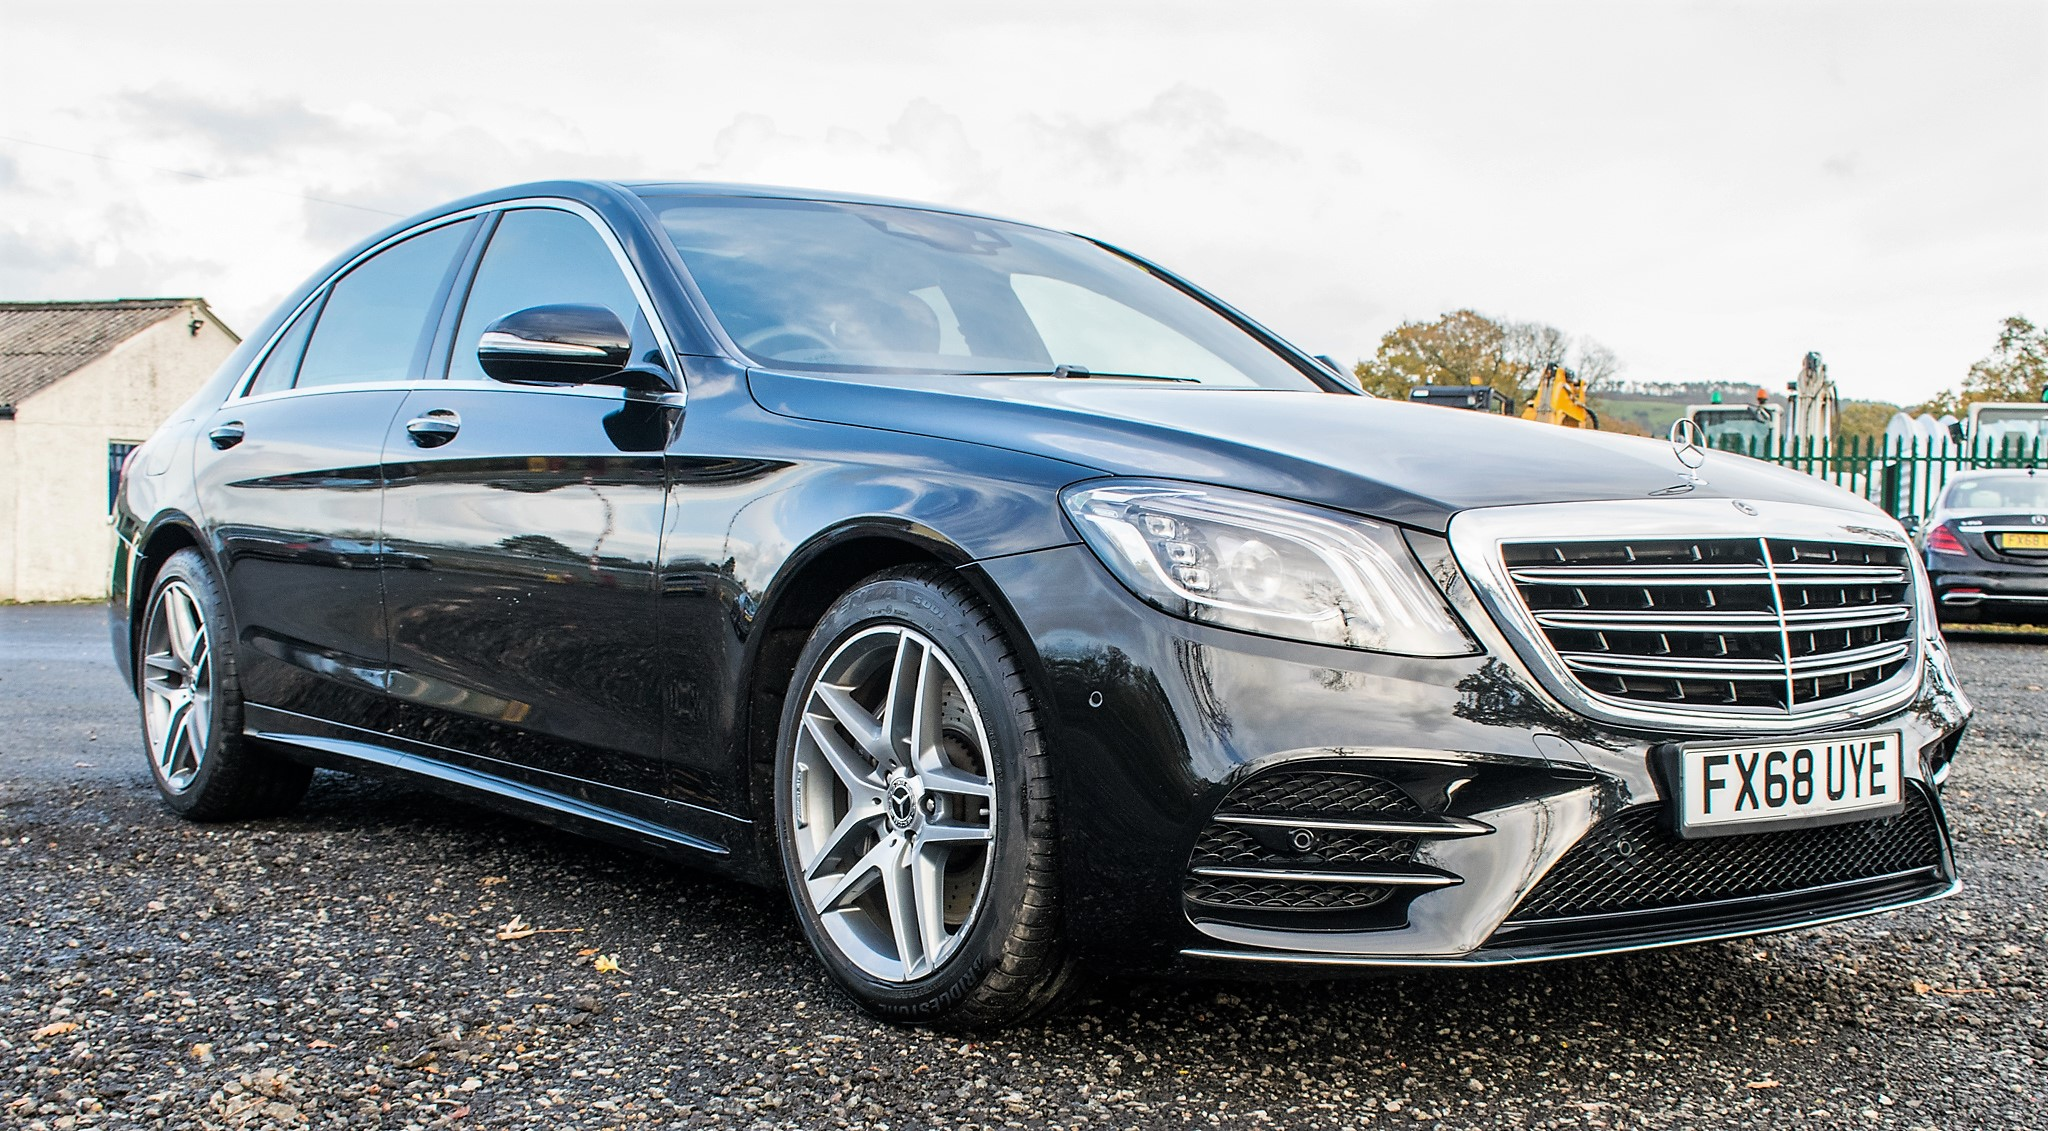 Mercedes Benz S450 L AMG Line Executive auto petrol 4 door saloon car Registration Number: FX68 - Image 2 of 33